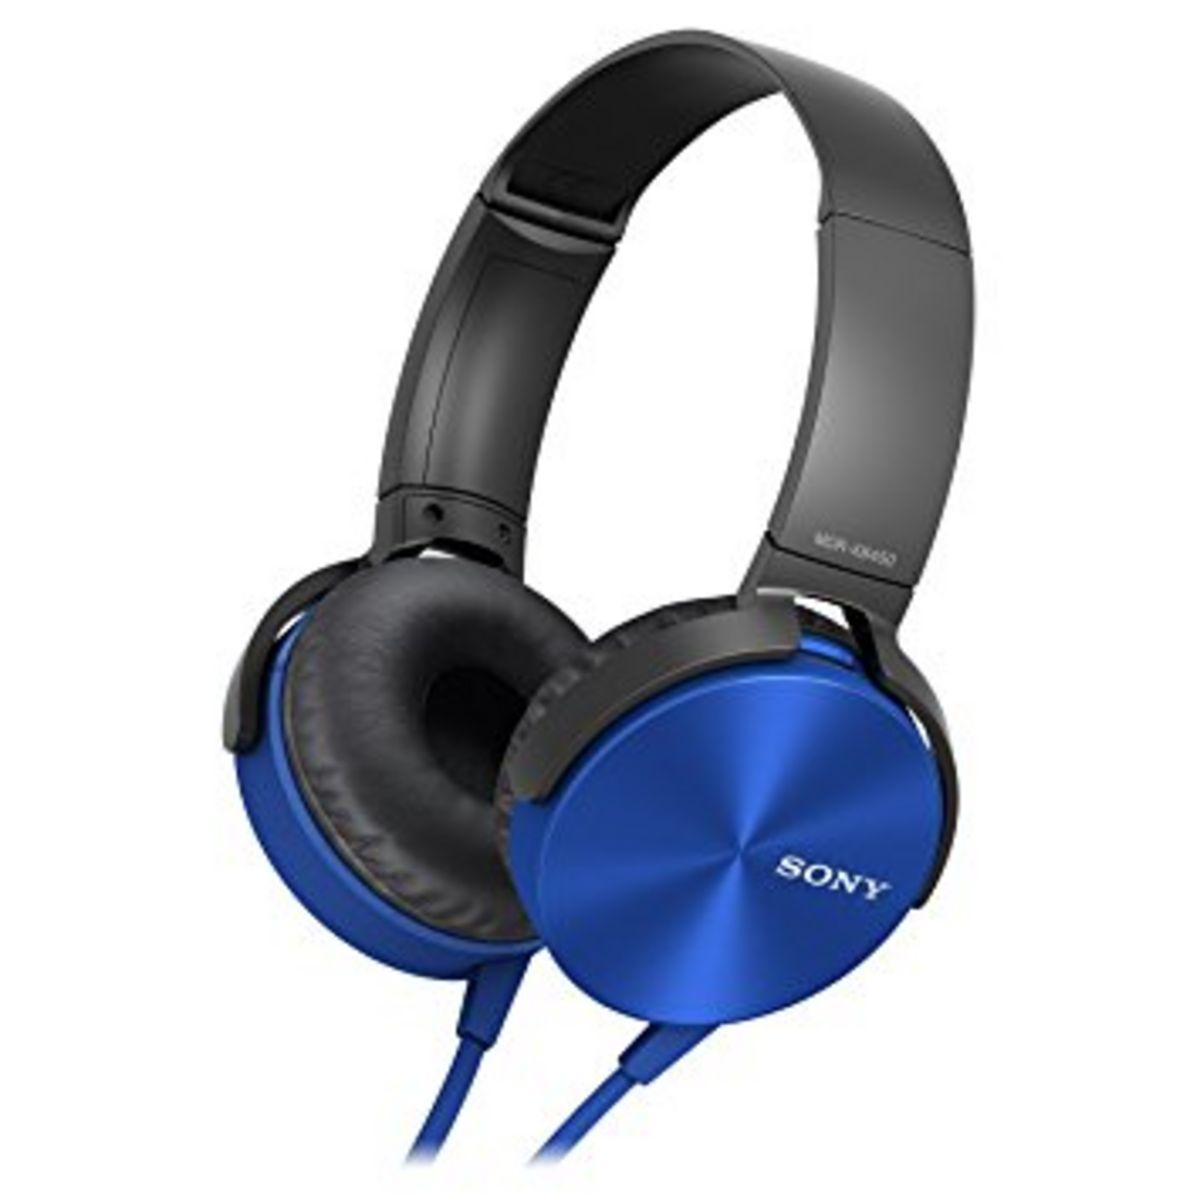 Casque audio Supra-aural MDR-XB550AP - Bleu